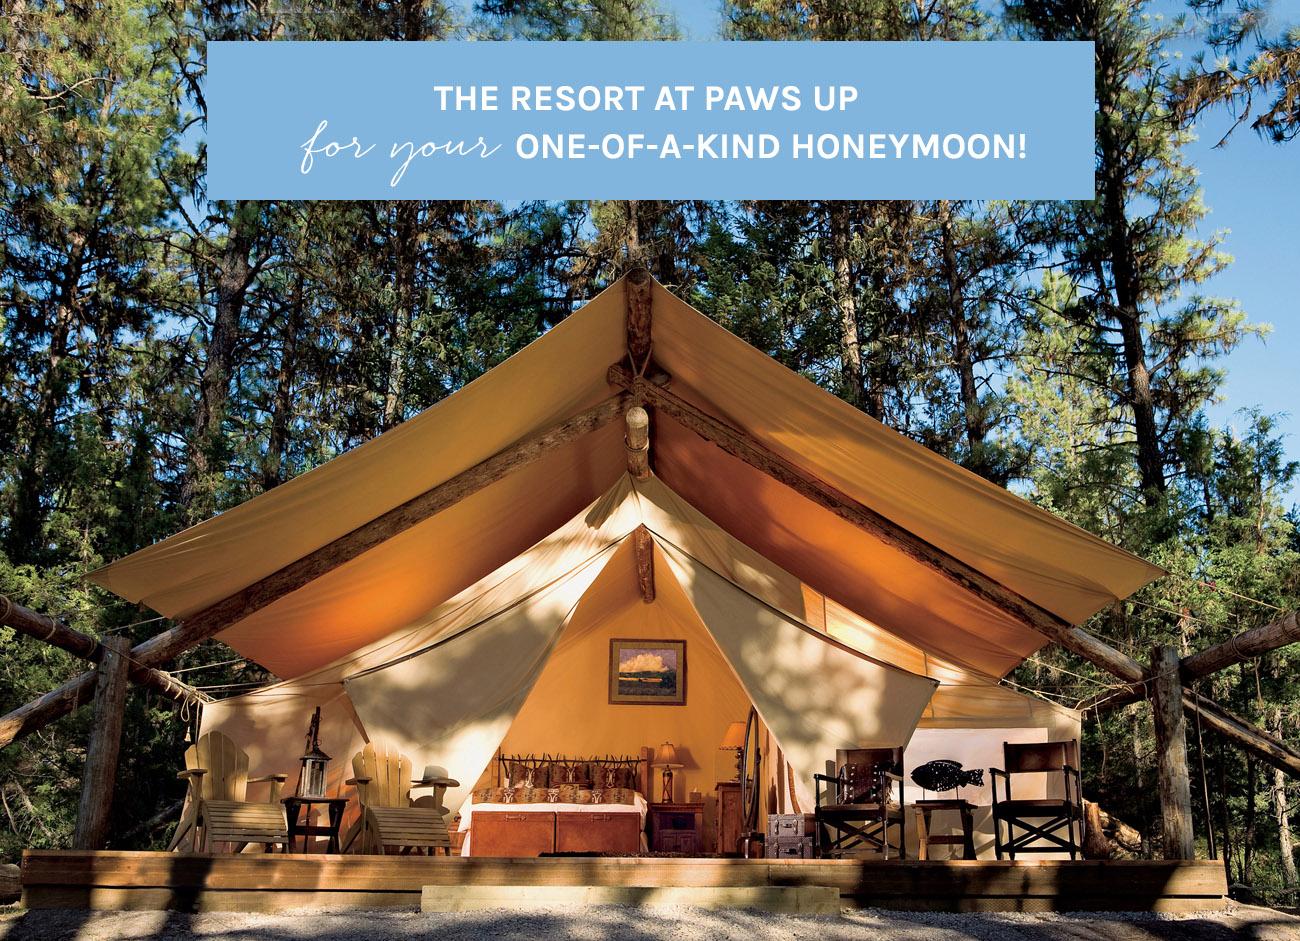 The Resort at Paws Up Honeymoon